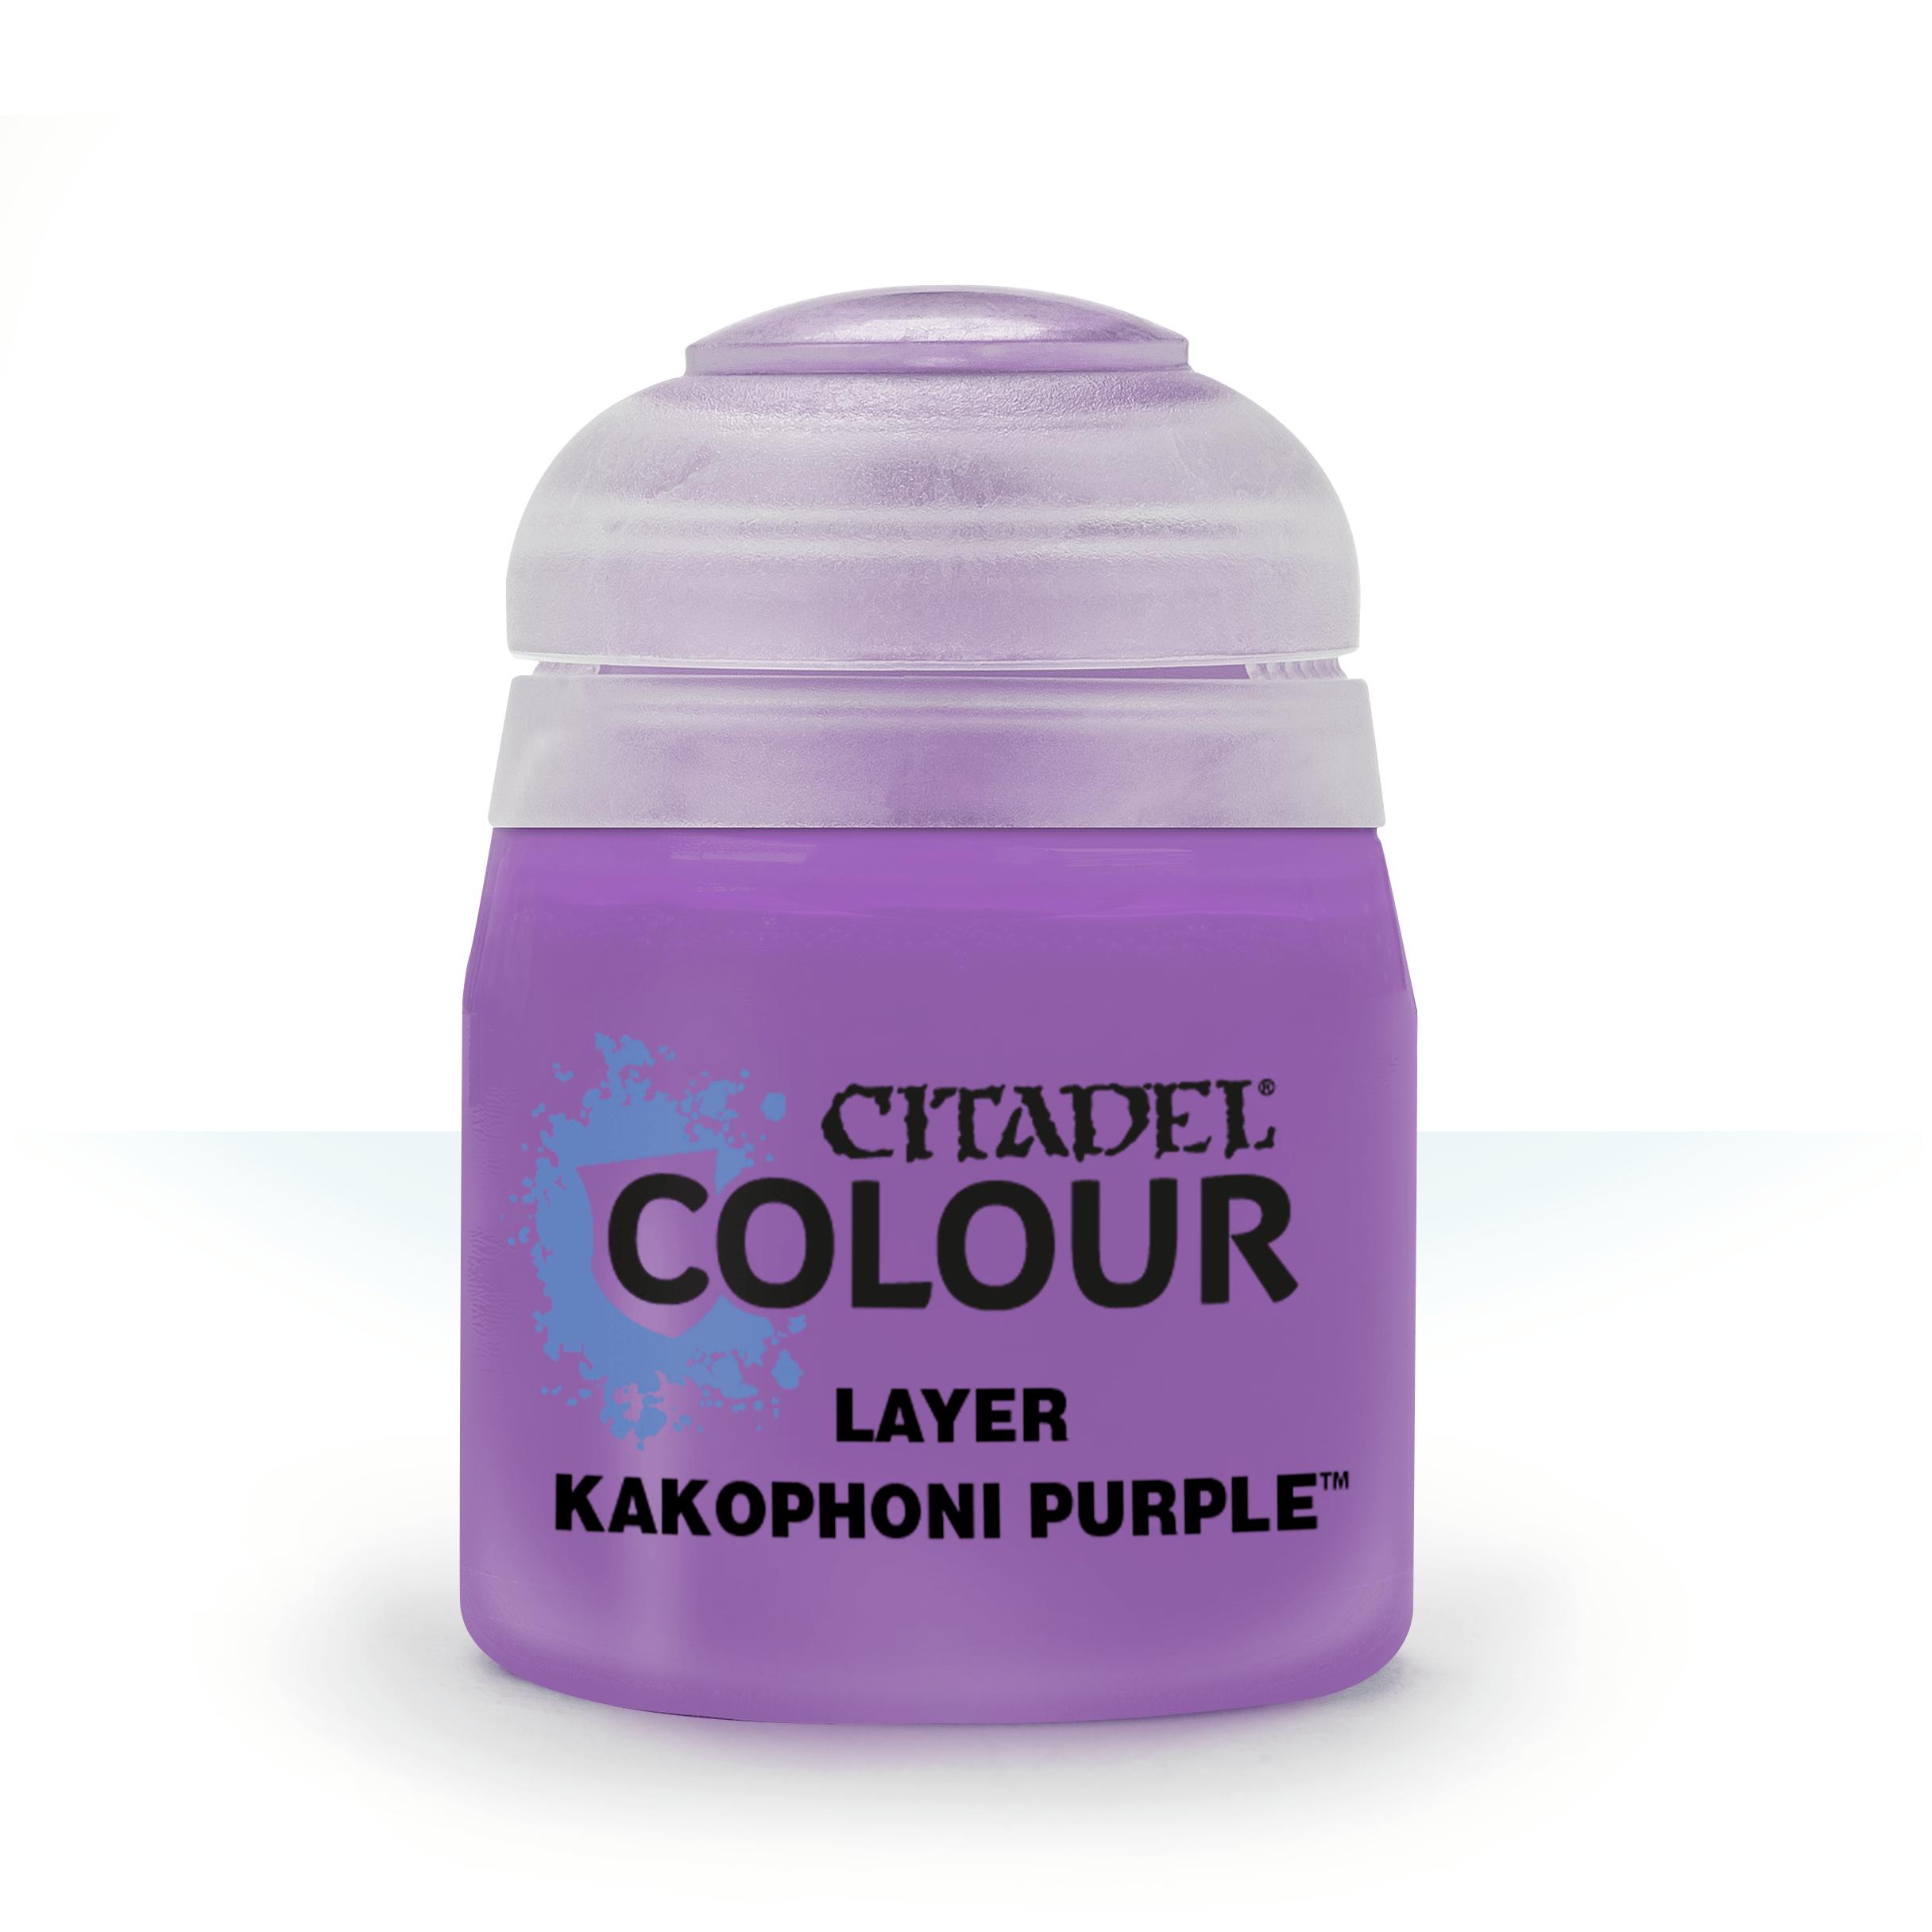 Kakophoni Purple, Citadel Layer 12ml